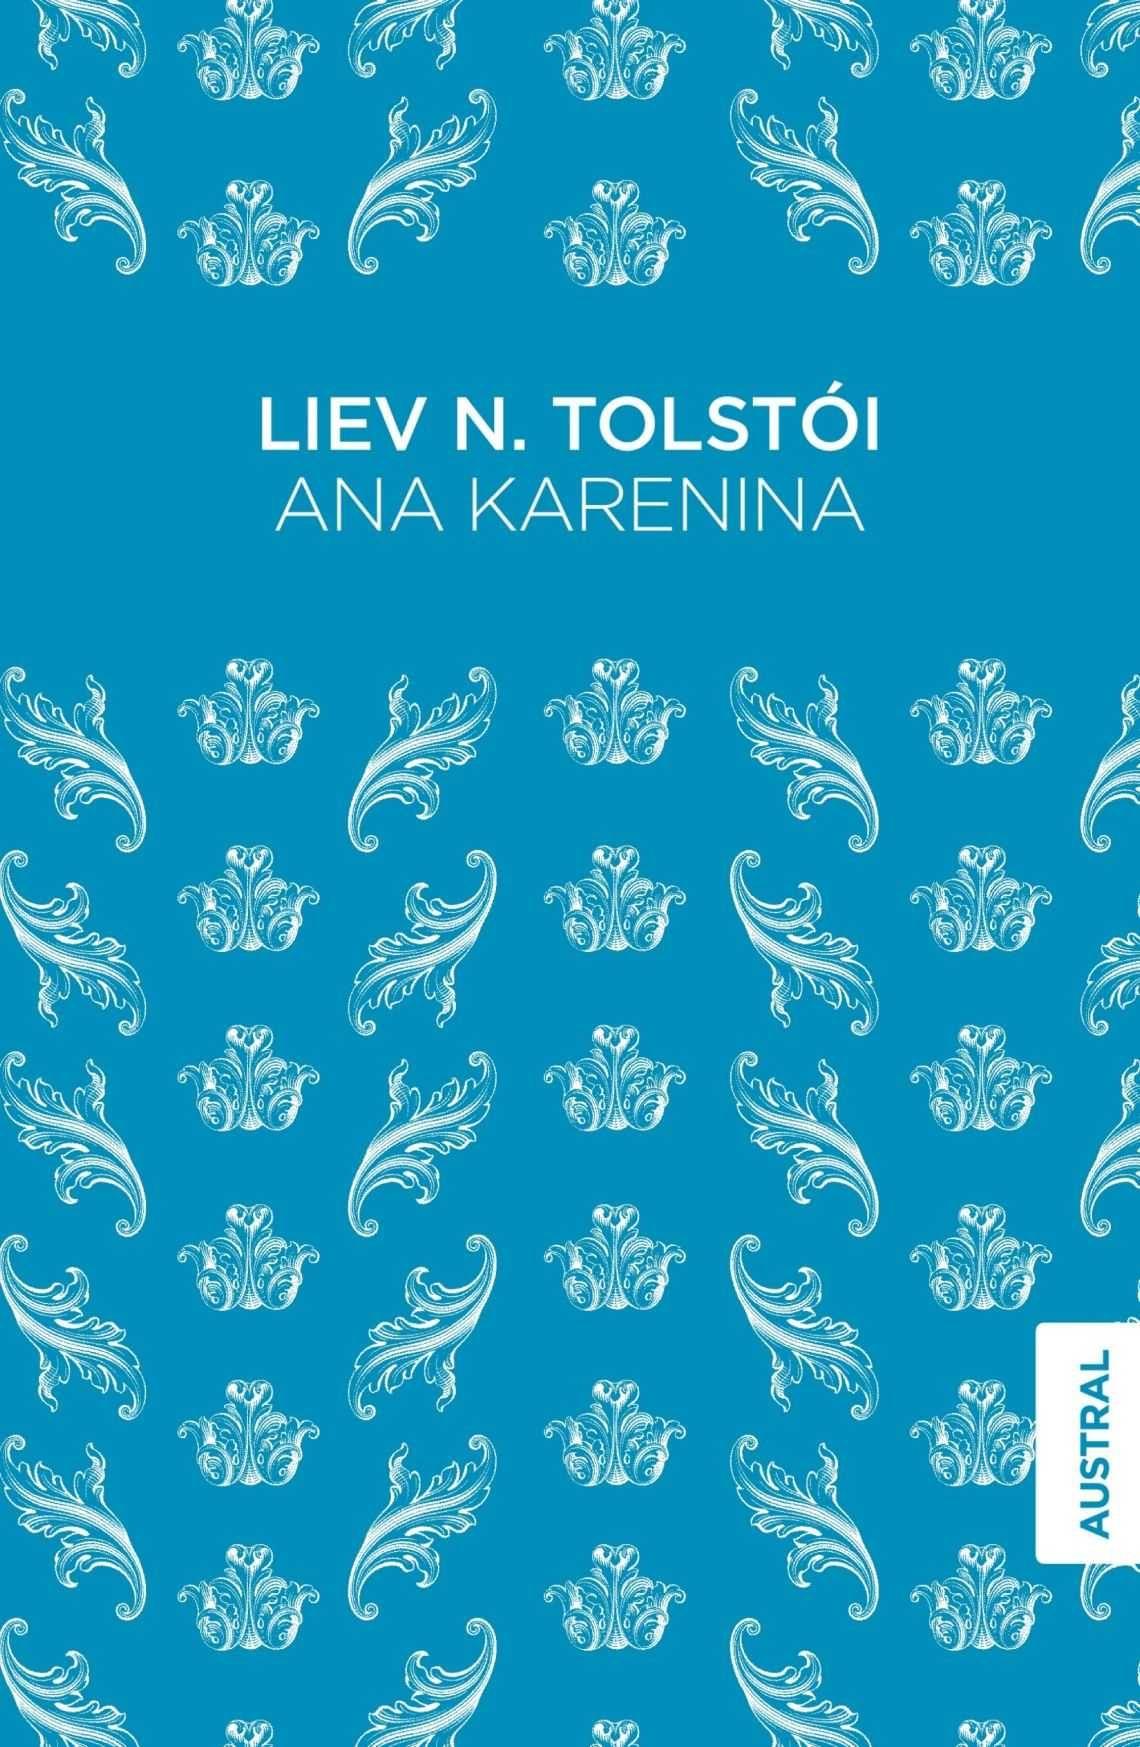 5 anécdotas sobre Tolstói, hoy que cumpliría 190 años_ana_karenina